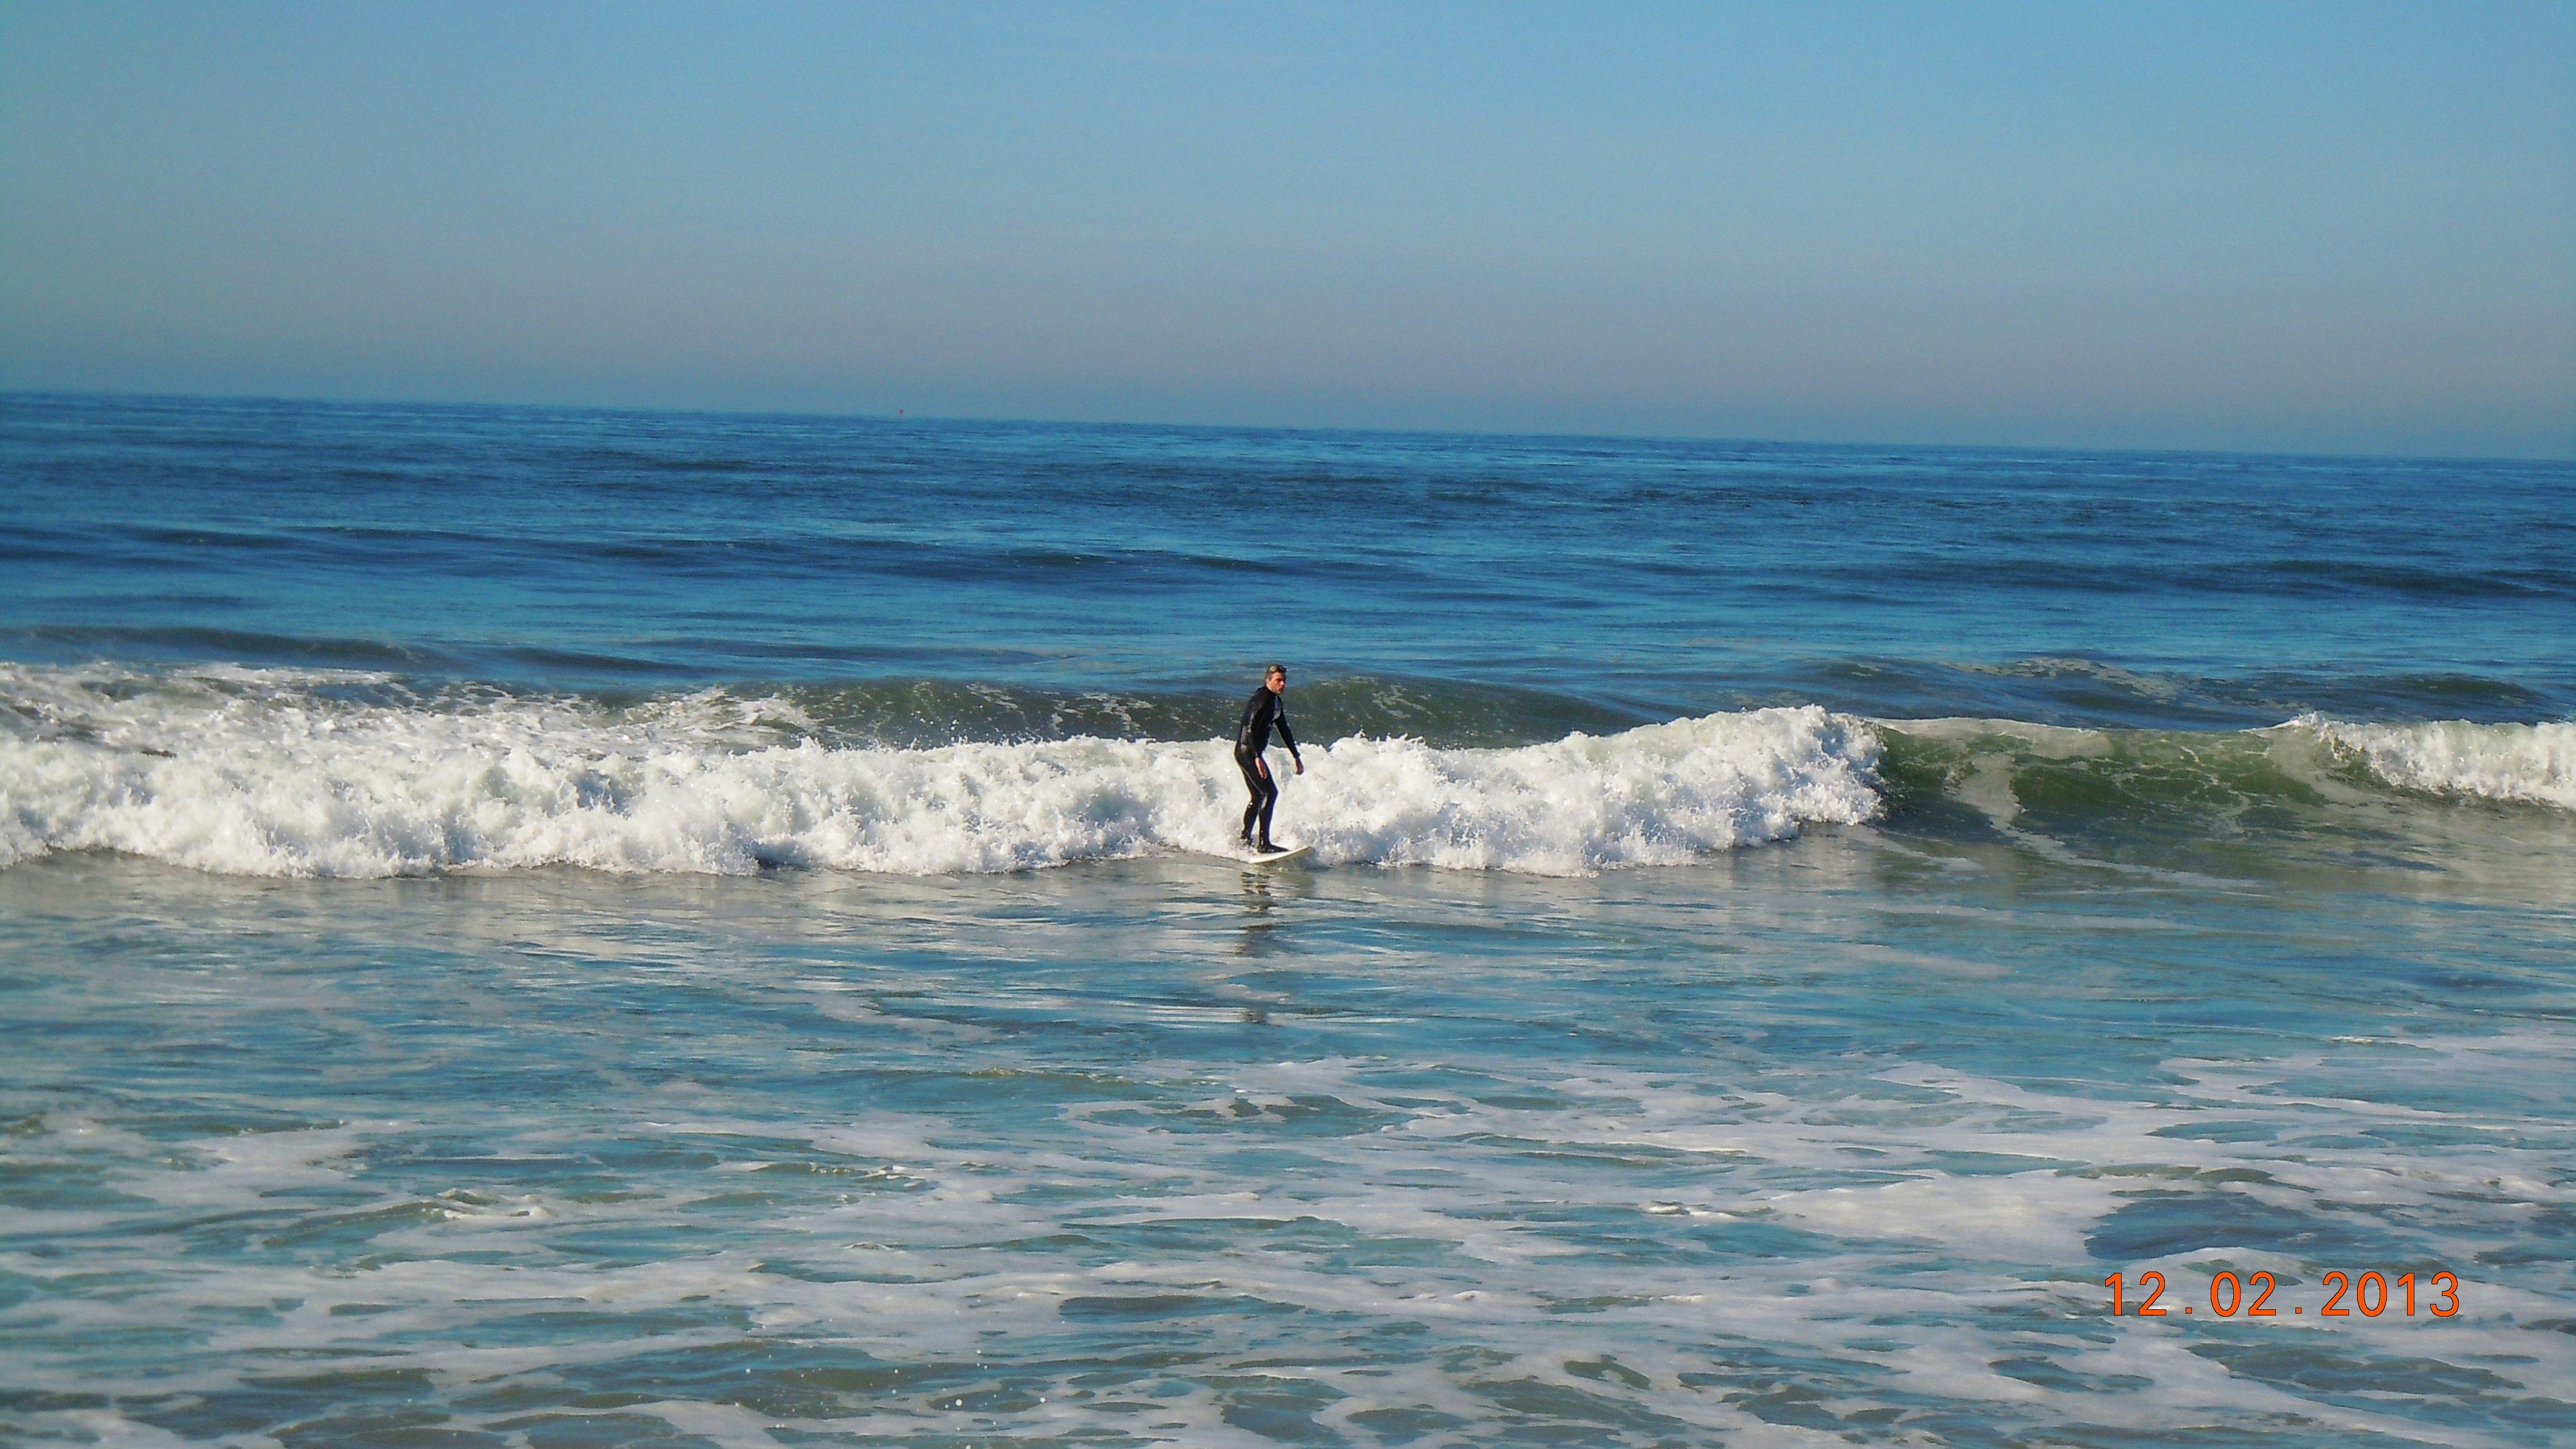 Surfer returning to dry land